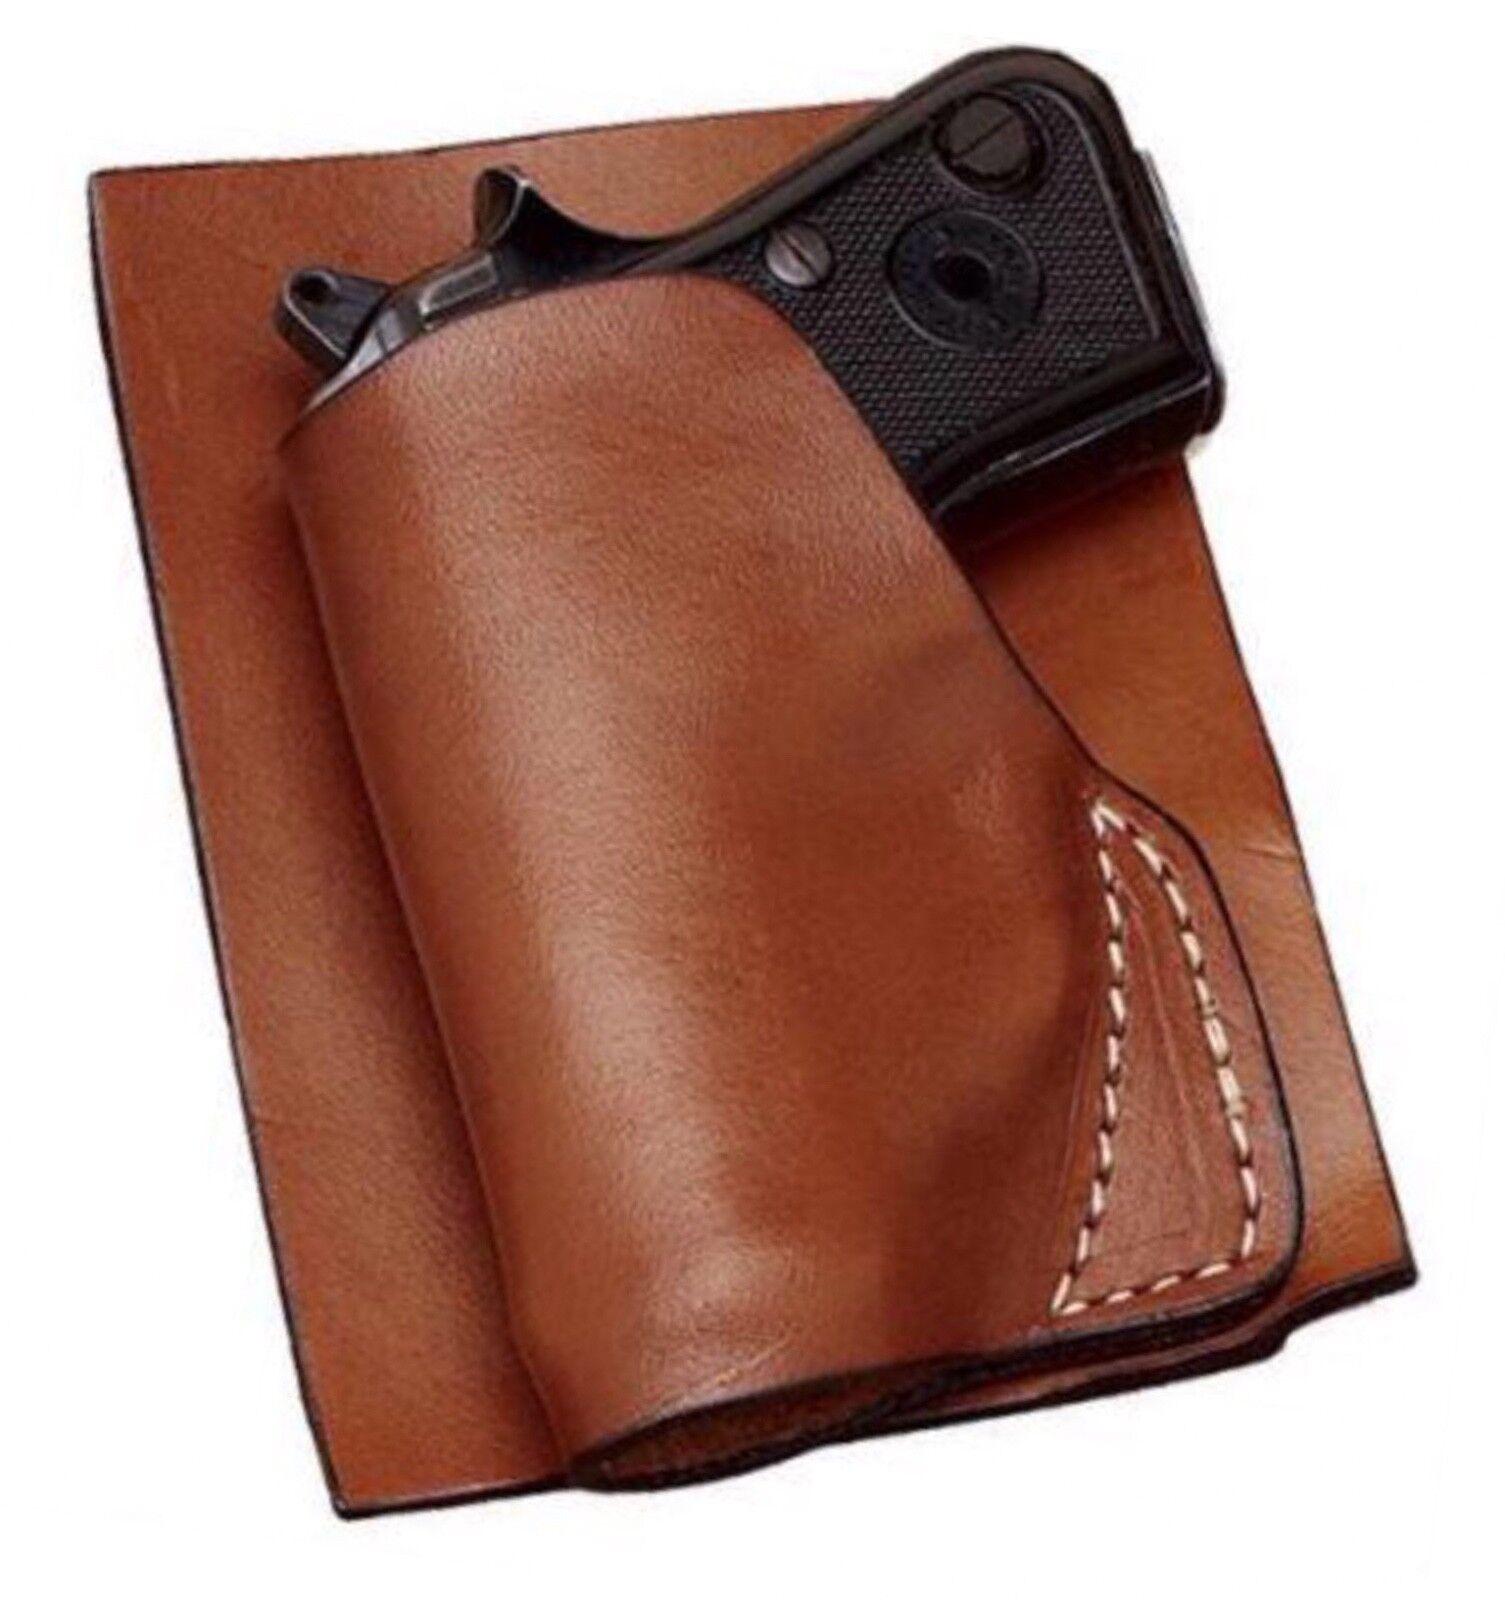 Hunter Holsters Leather Pocket Holster for Glock 42 2500-15